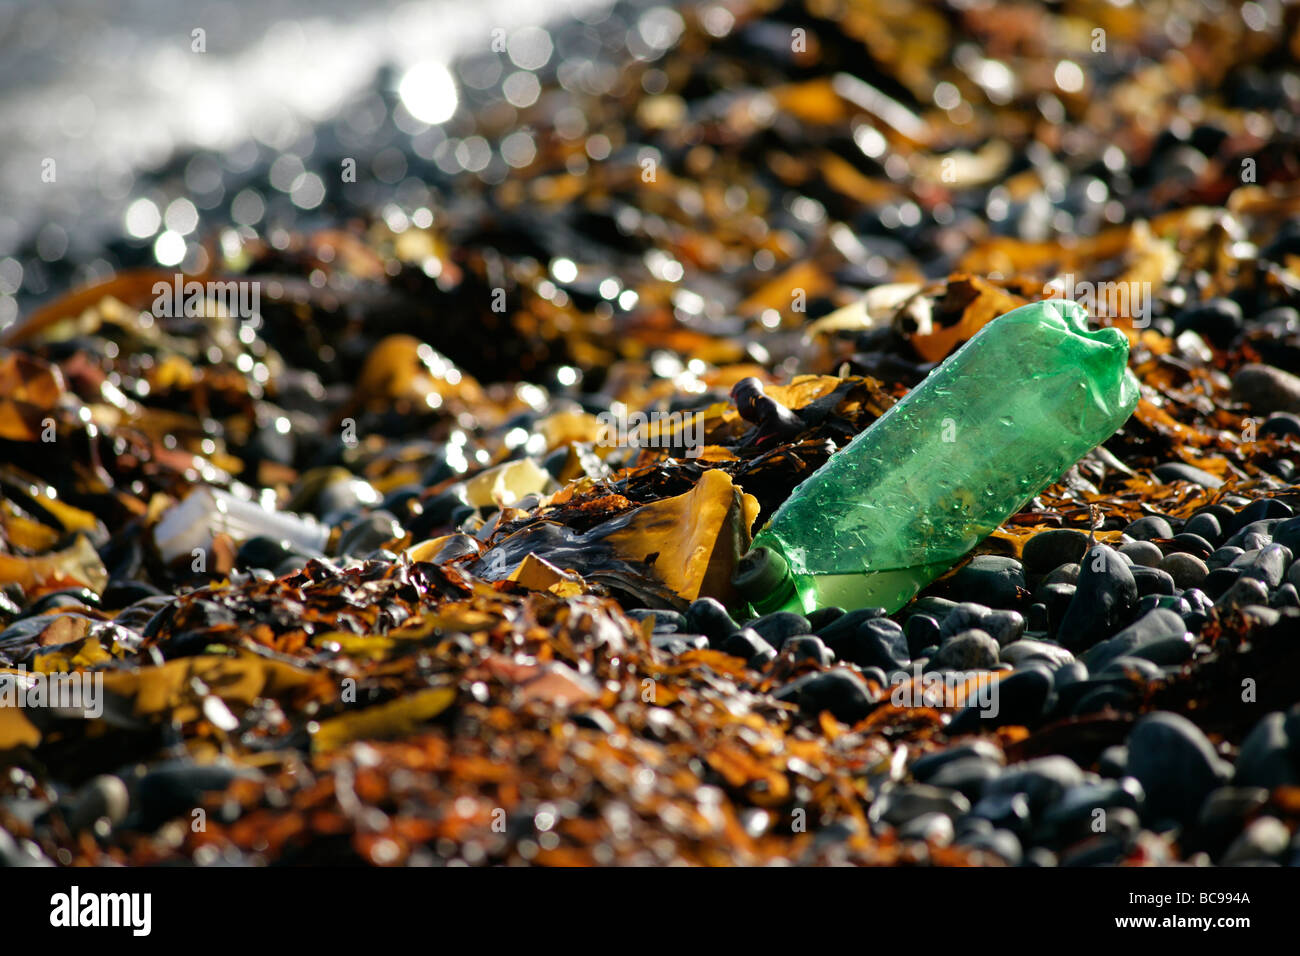 Turning back the plastic tide. Discarded plastic bottle on Penzance beach - Stock Image